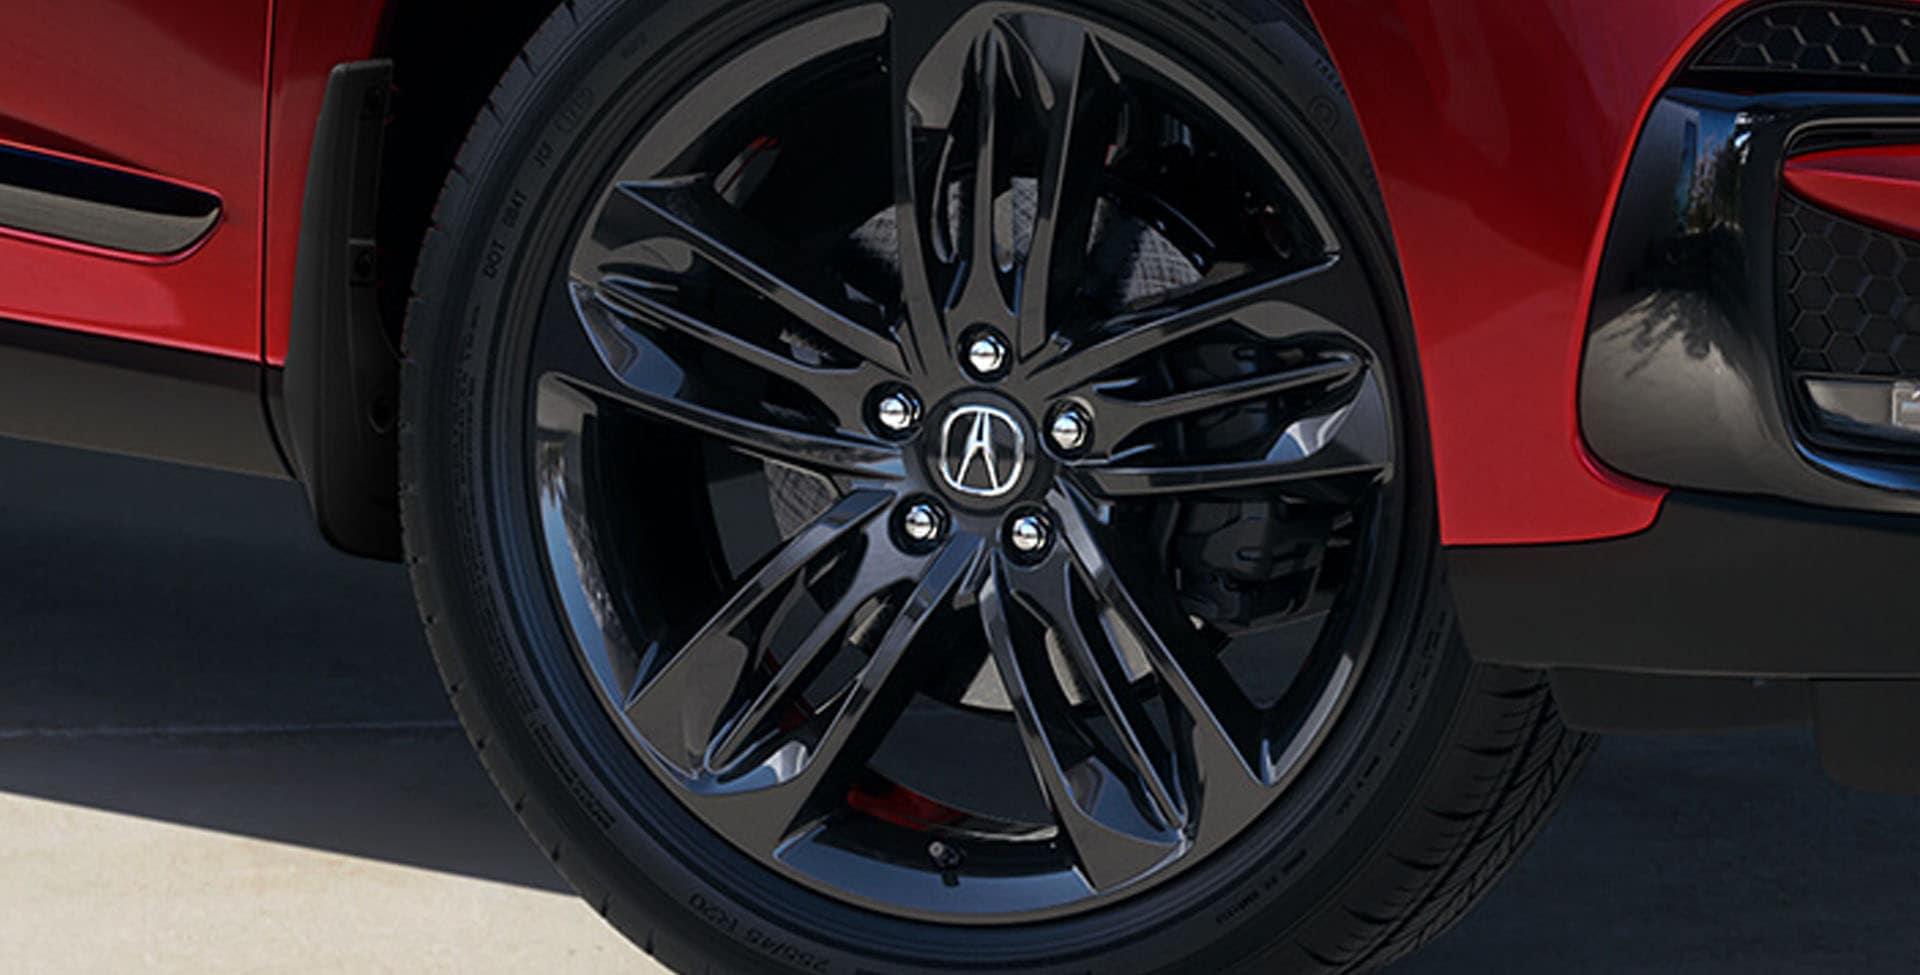 Acura RDX wheels